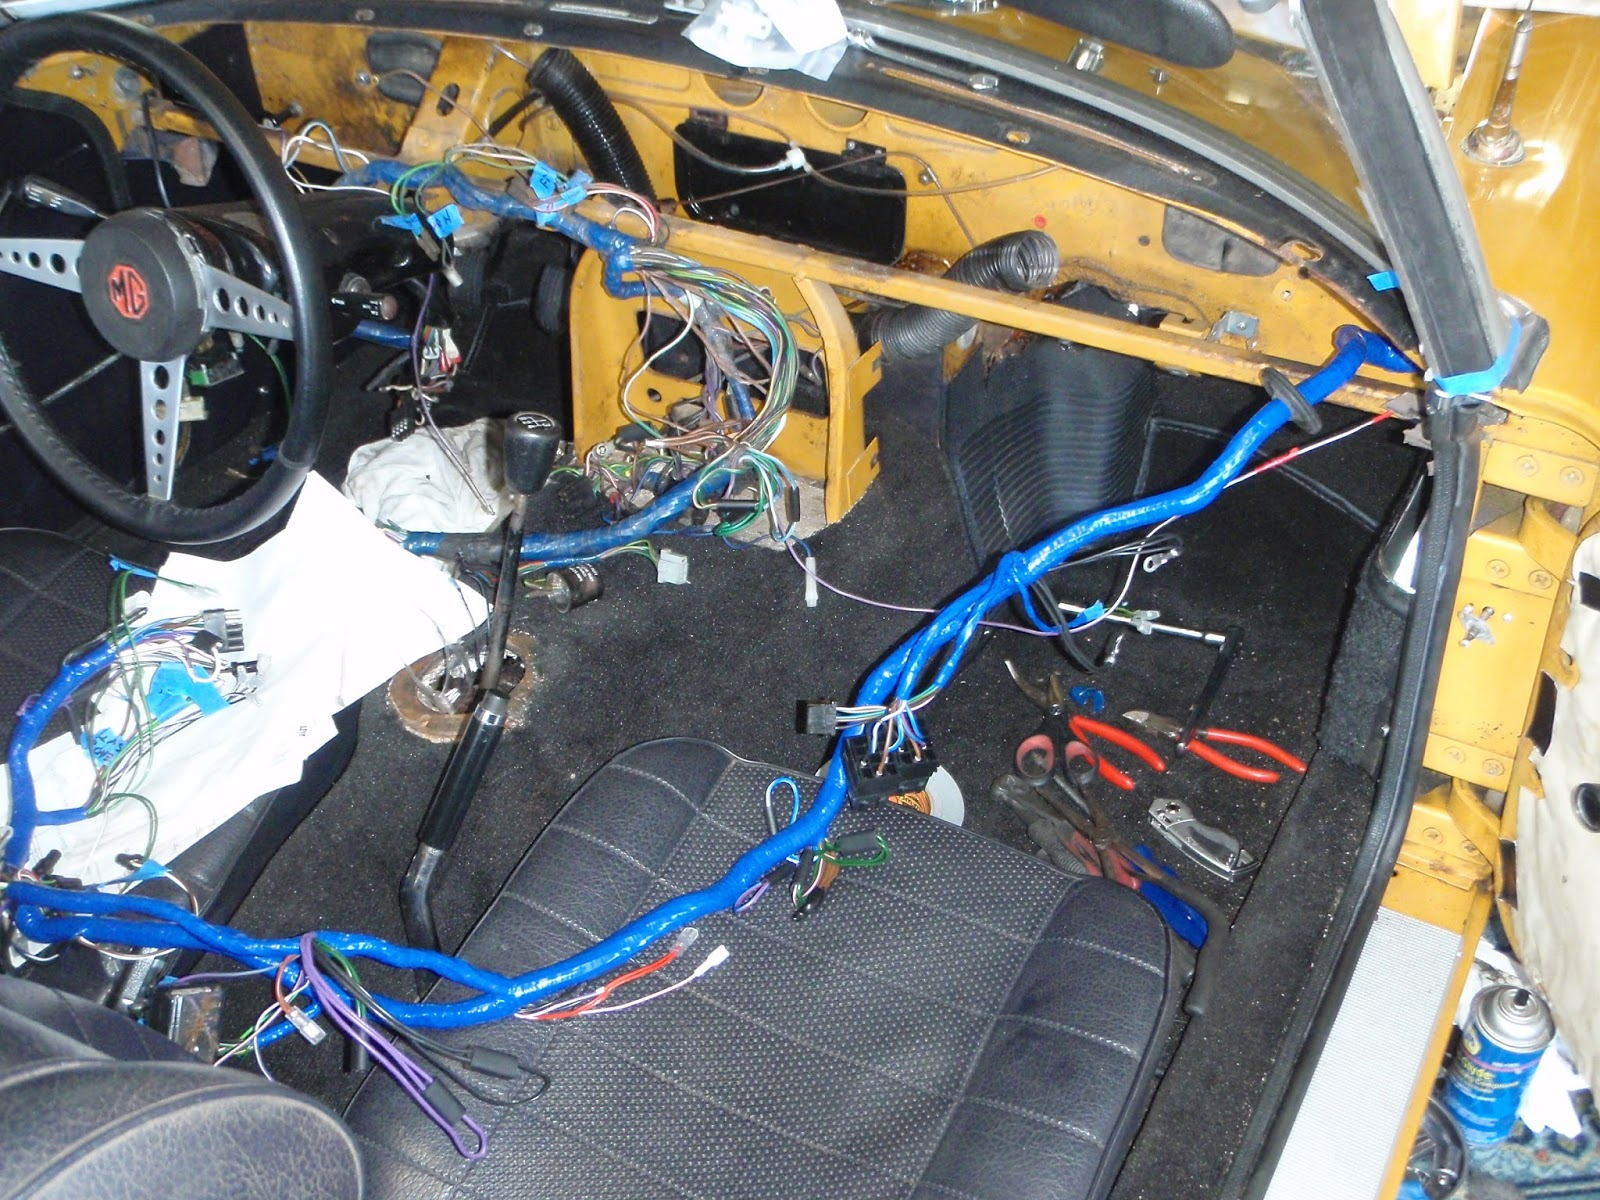 MGB in the Garage: New wiring harness, vinyl top, alternator, etc